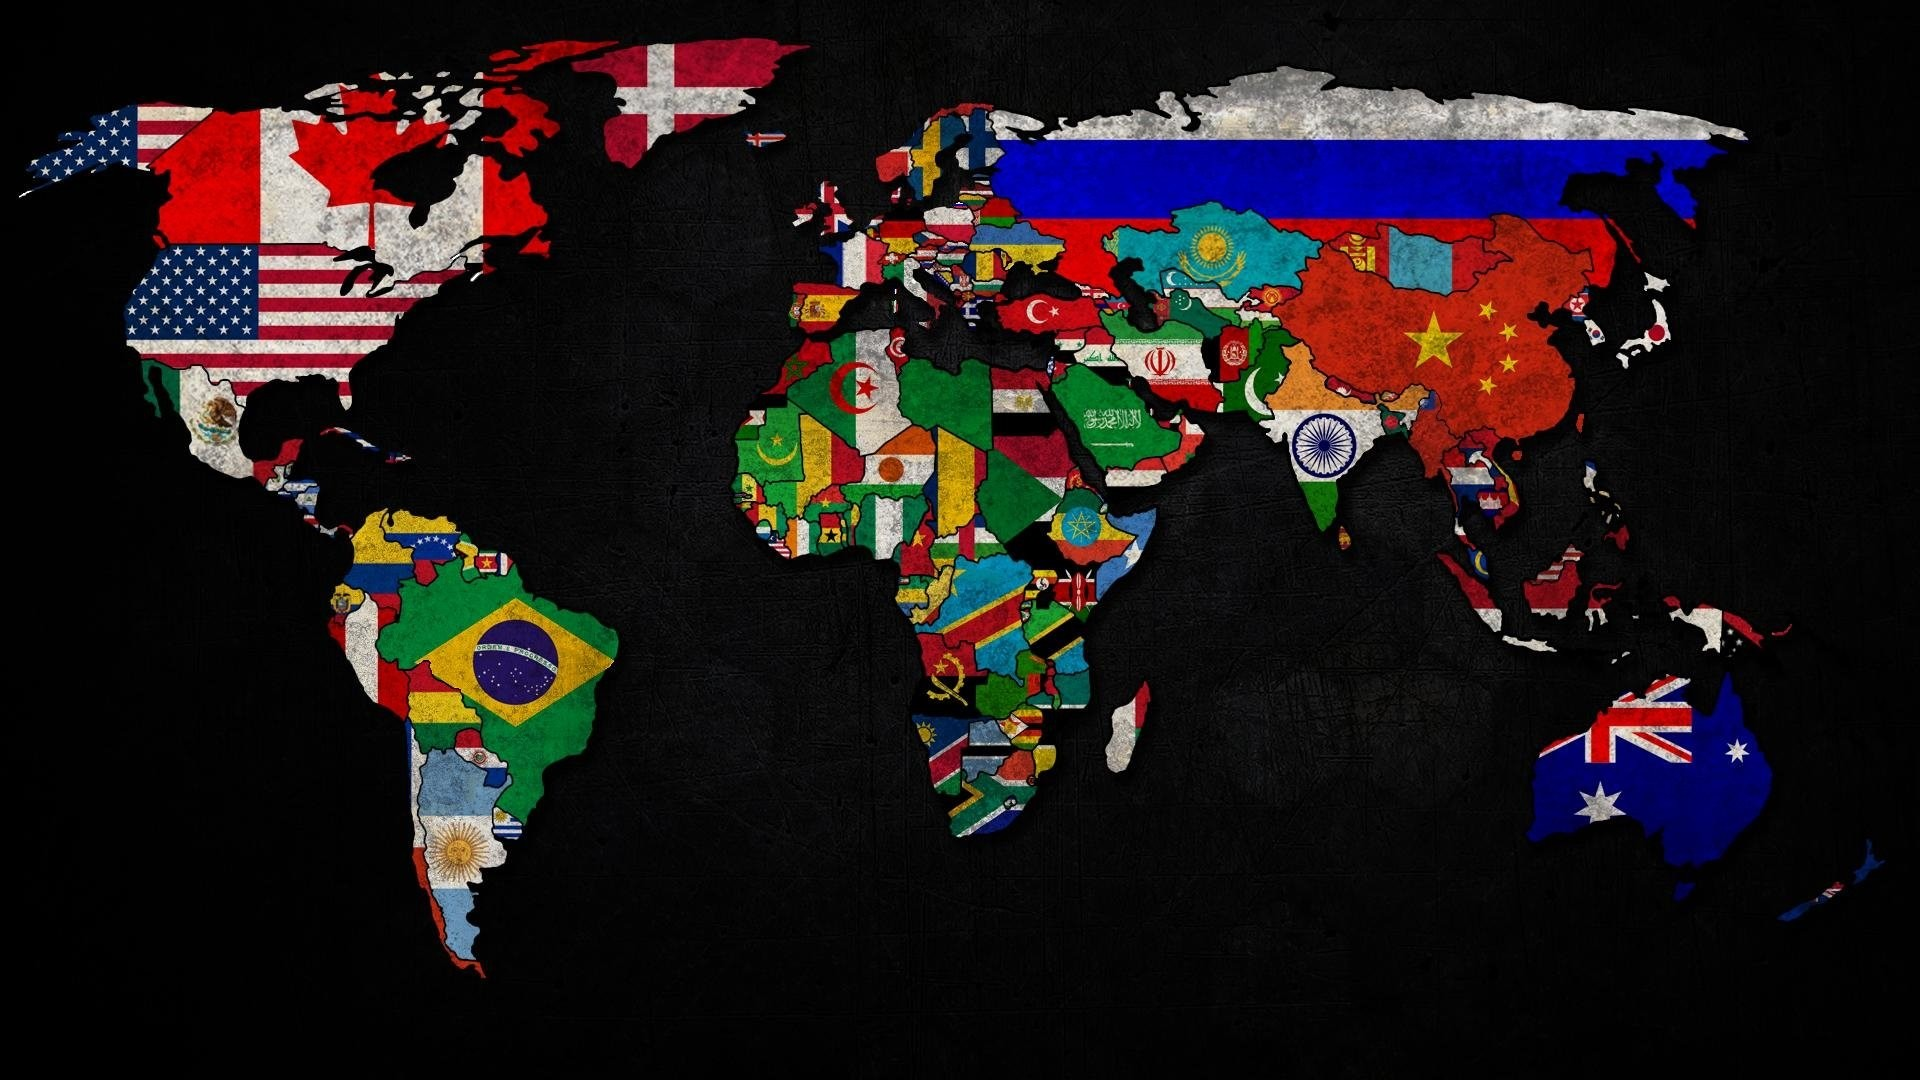 World Map Computer Wallpaper Images - World map hd wallpaper free download